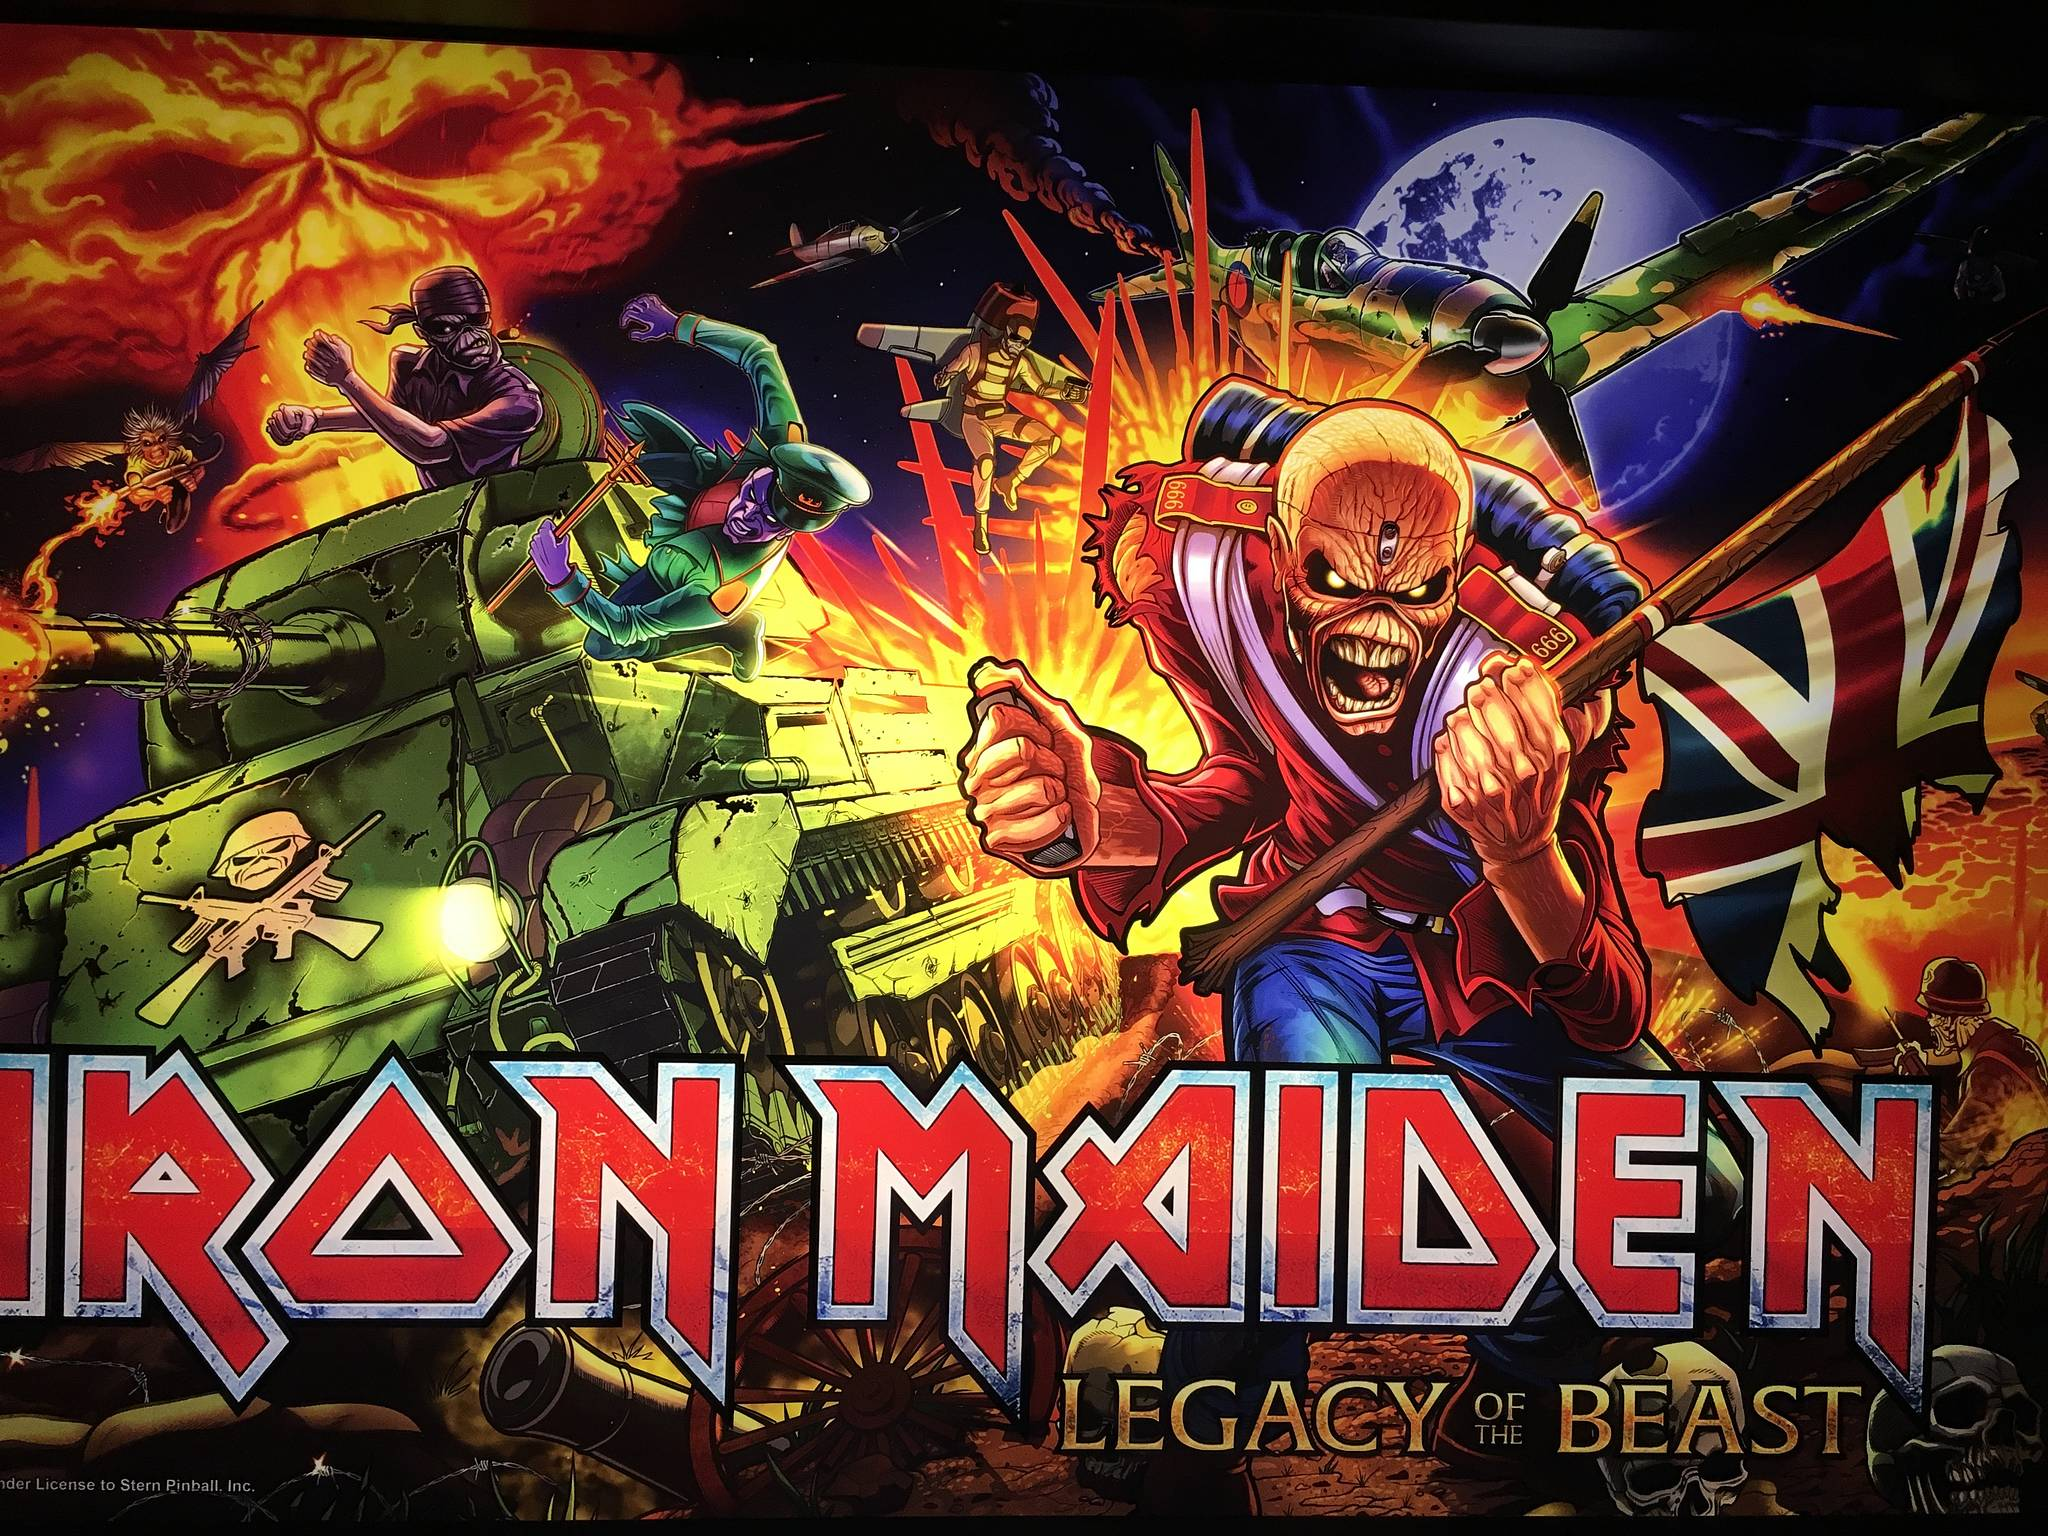 Iron Maiden: Legacy of the Beast (Premium/LE) Pinball